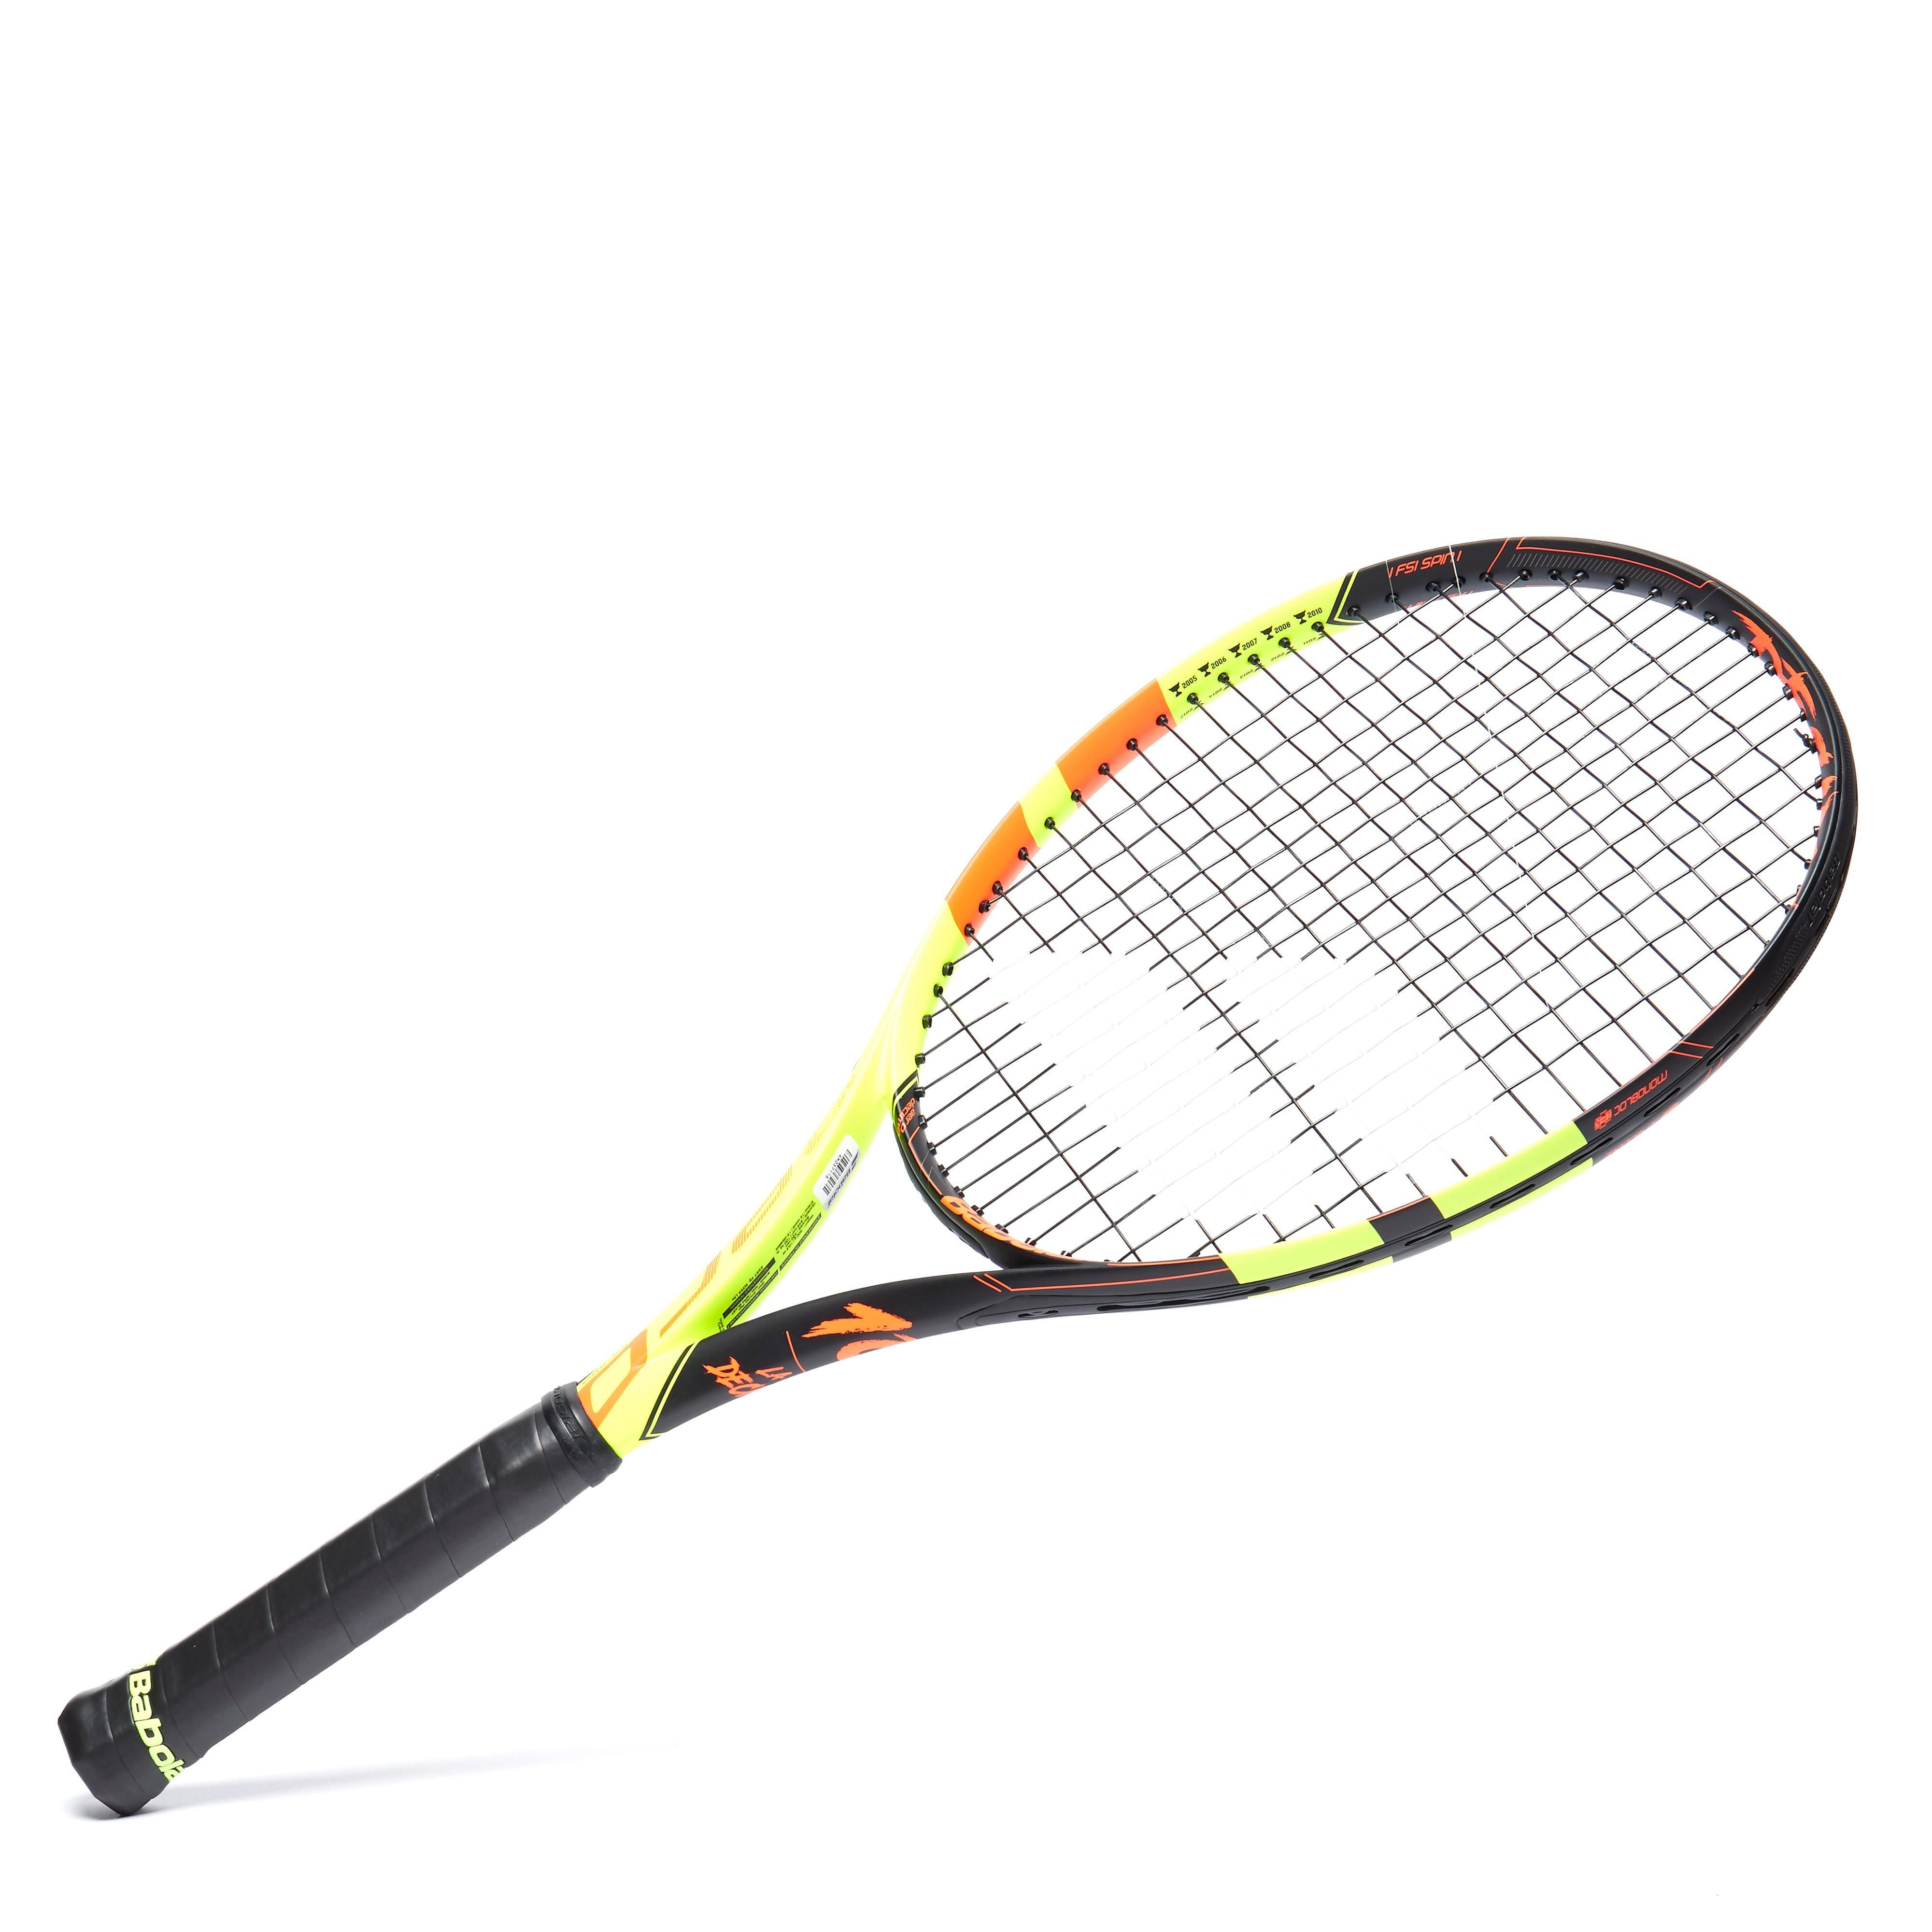 Babolat Pure Aero Decima Tennis Racket